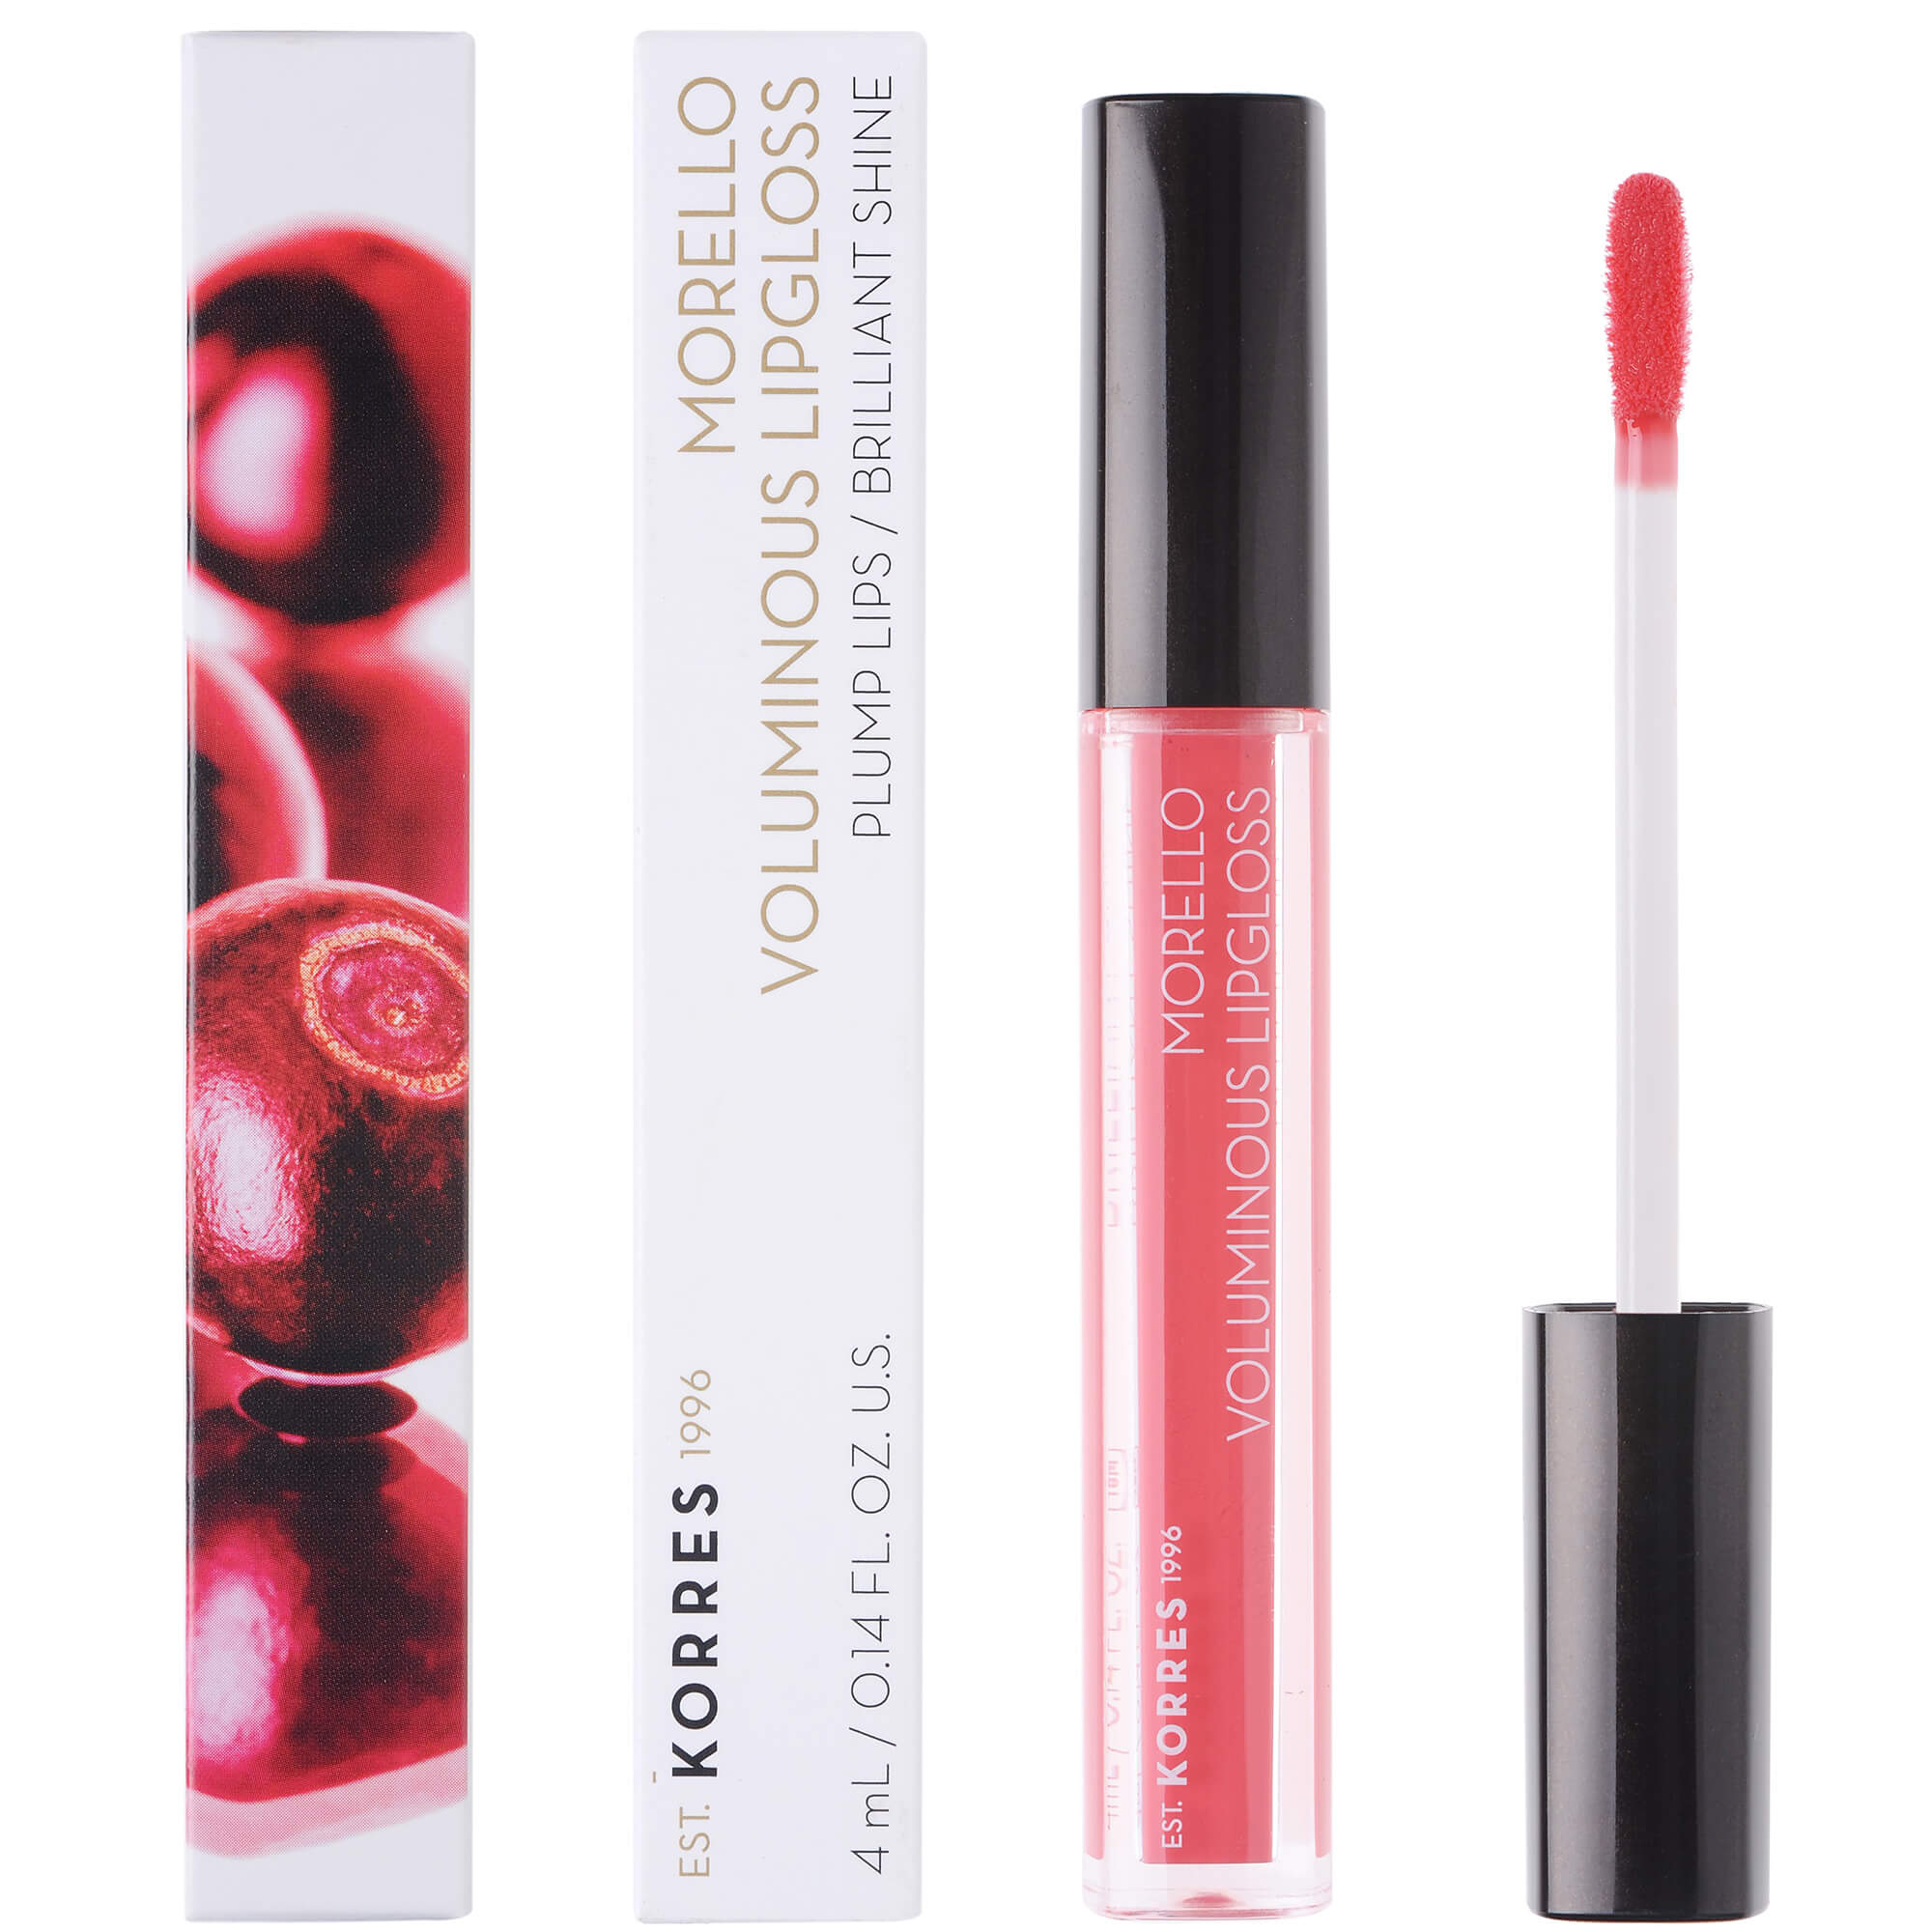 Korres Morello Voluminous Lipgloss Brilliant Shine Ενυδατικό Lipgloss με Εξαιρετική Λάμψη & Γεμάτο Χρώμα που Διαρκεί 4ml – 42 Peachy Coral